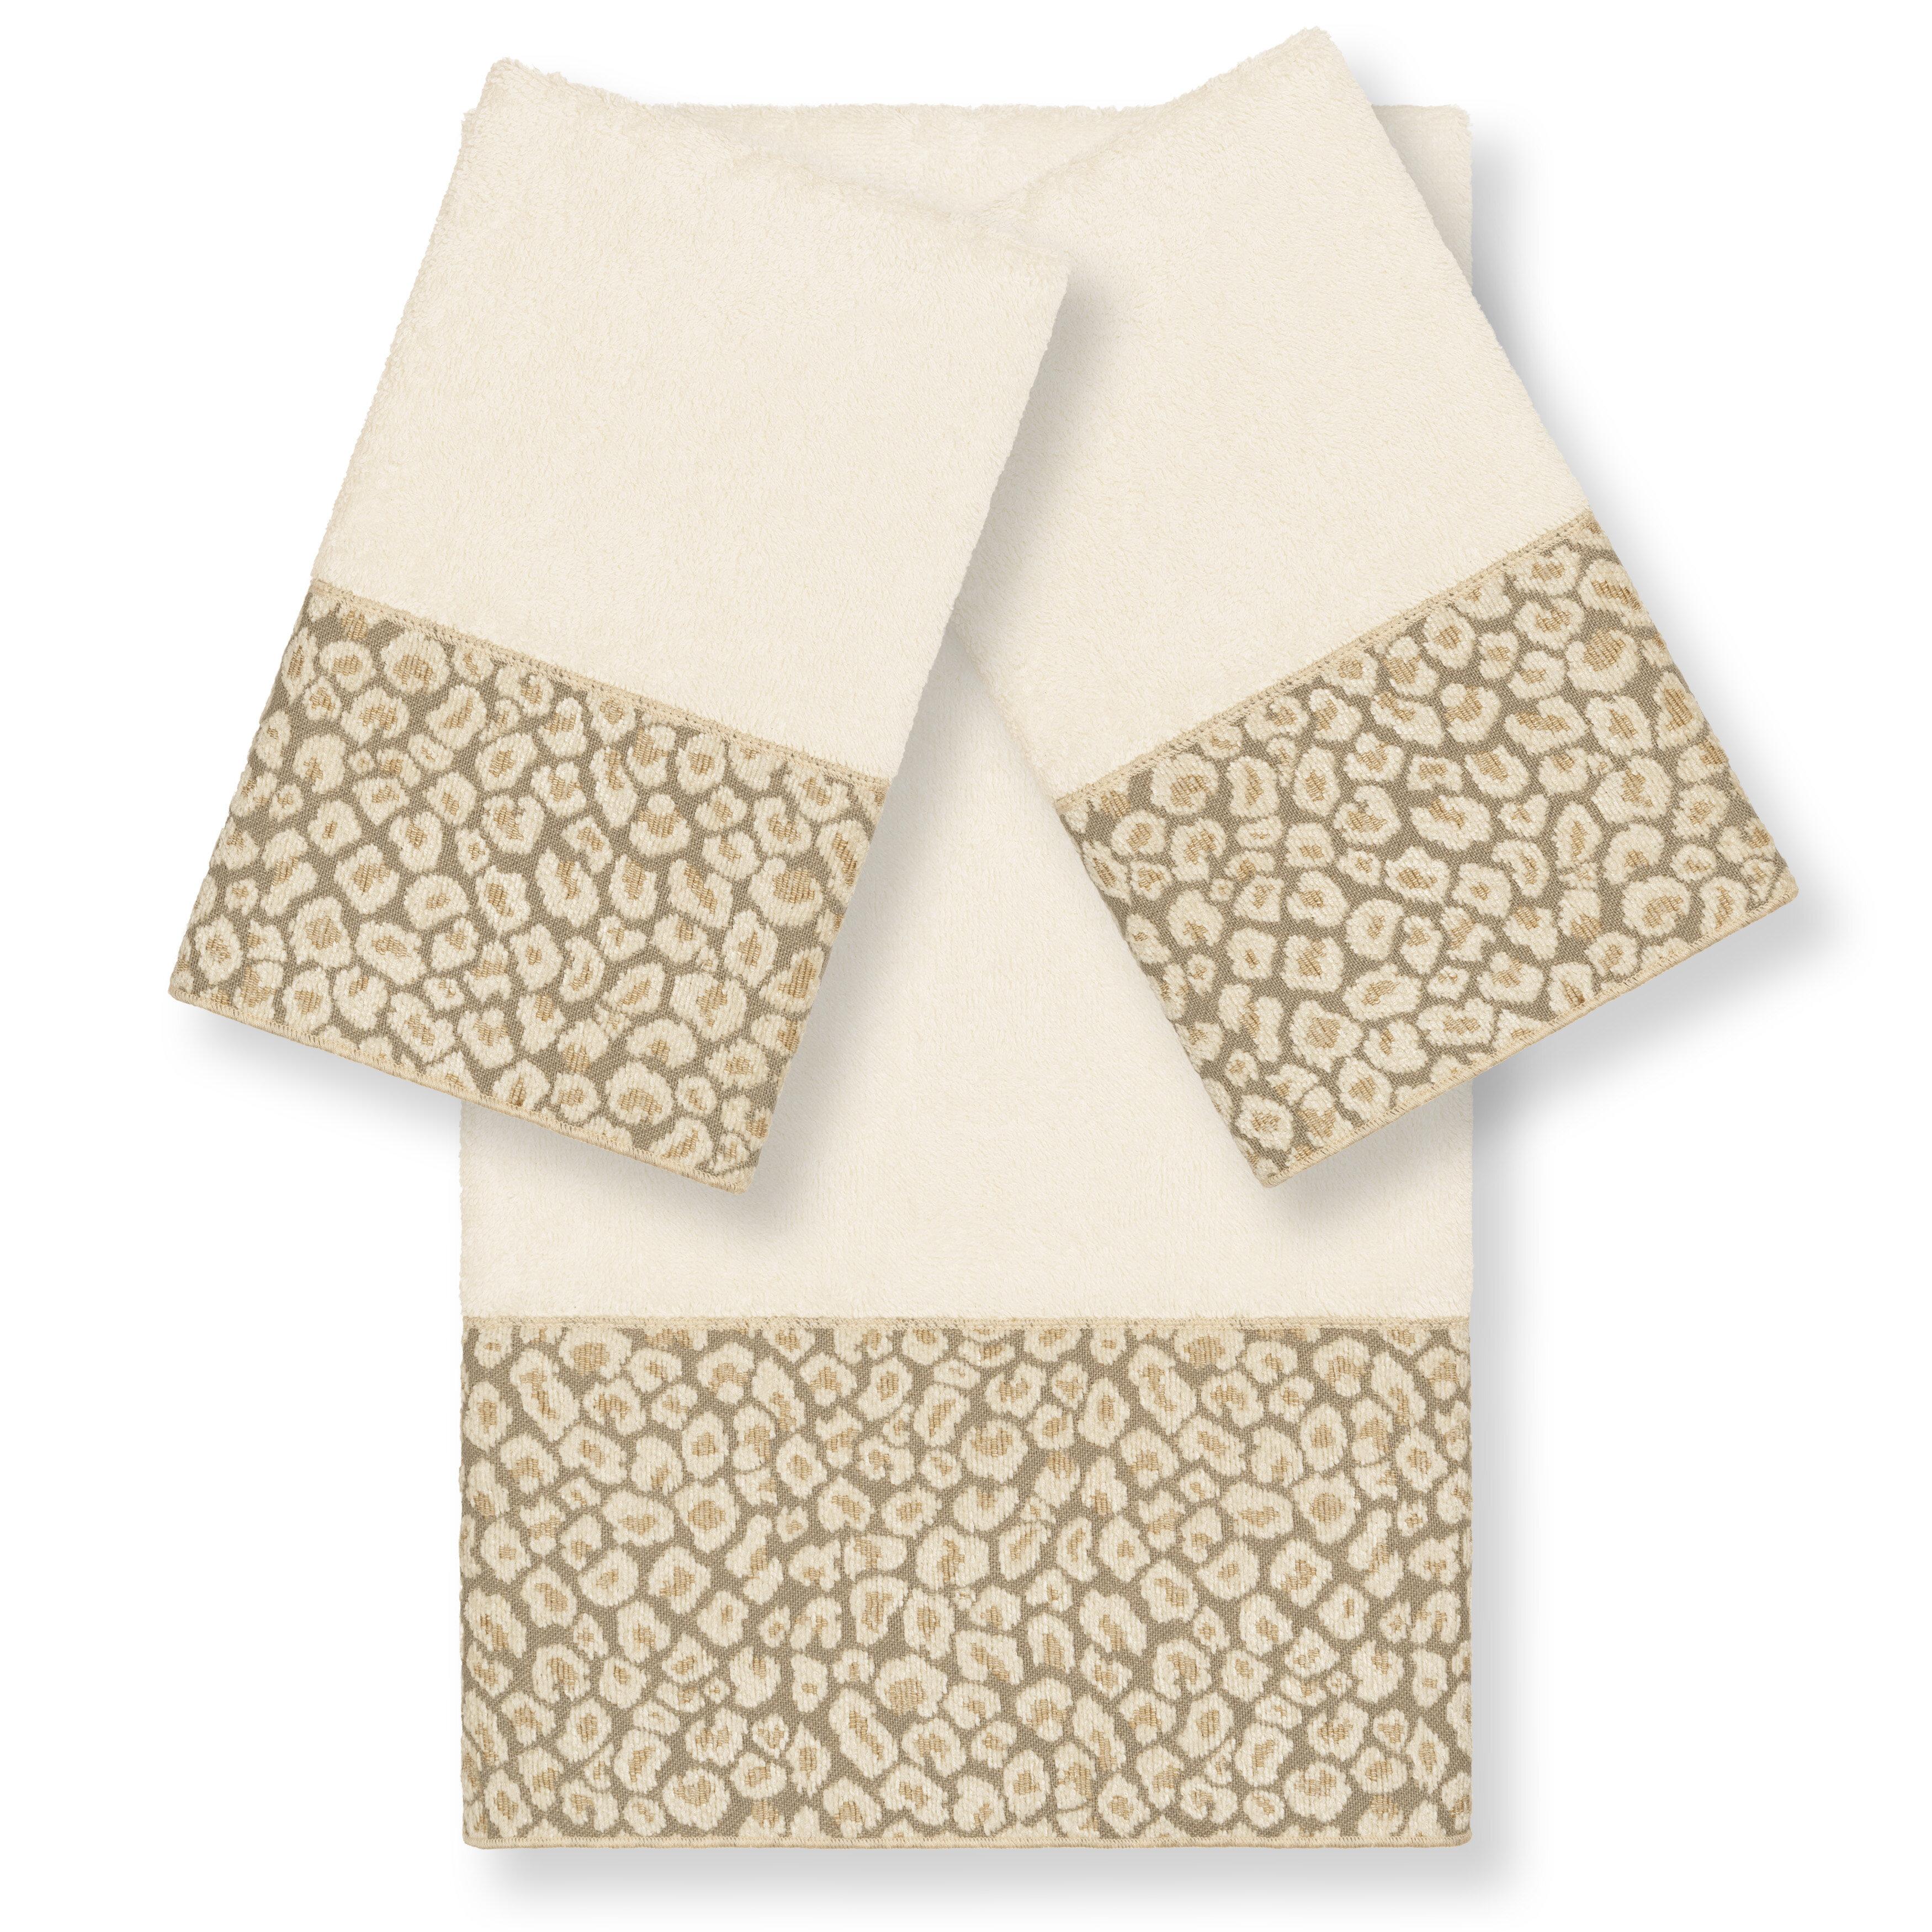 Mercer41 Forsyth 3 Piece Turkish Cotton Towel Set Wayfair